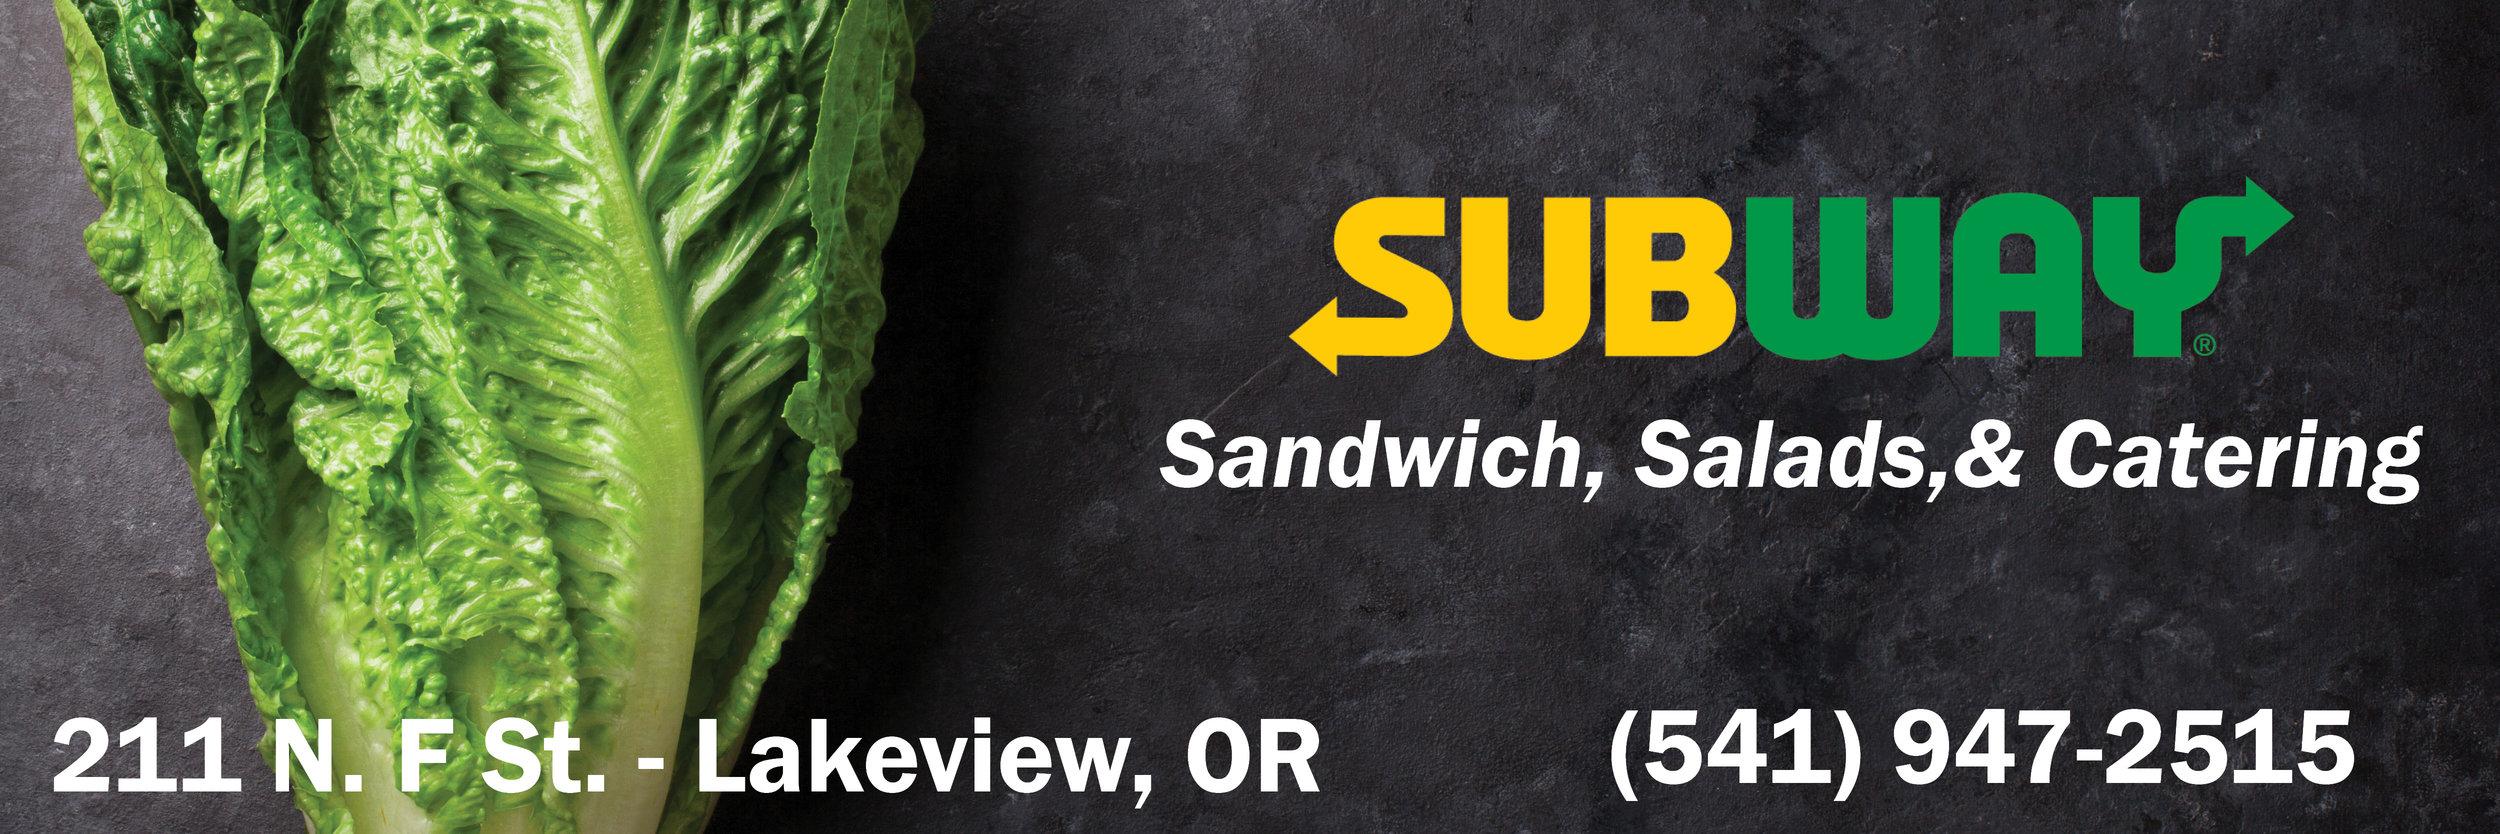 Subway  Cover.jpg